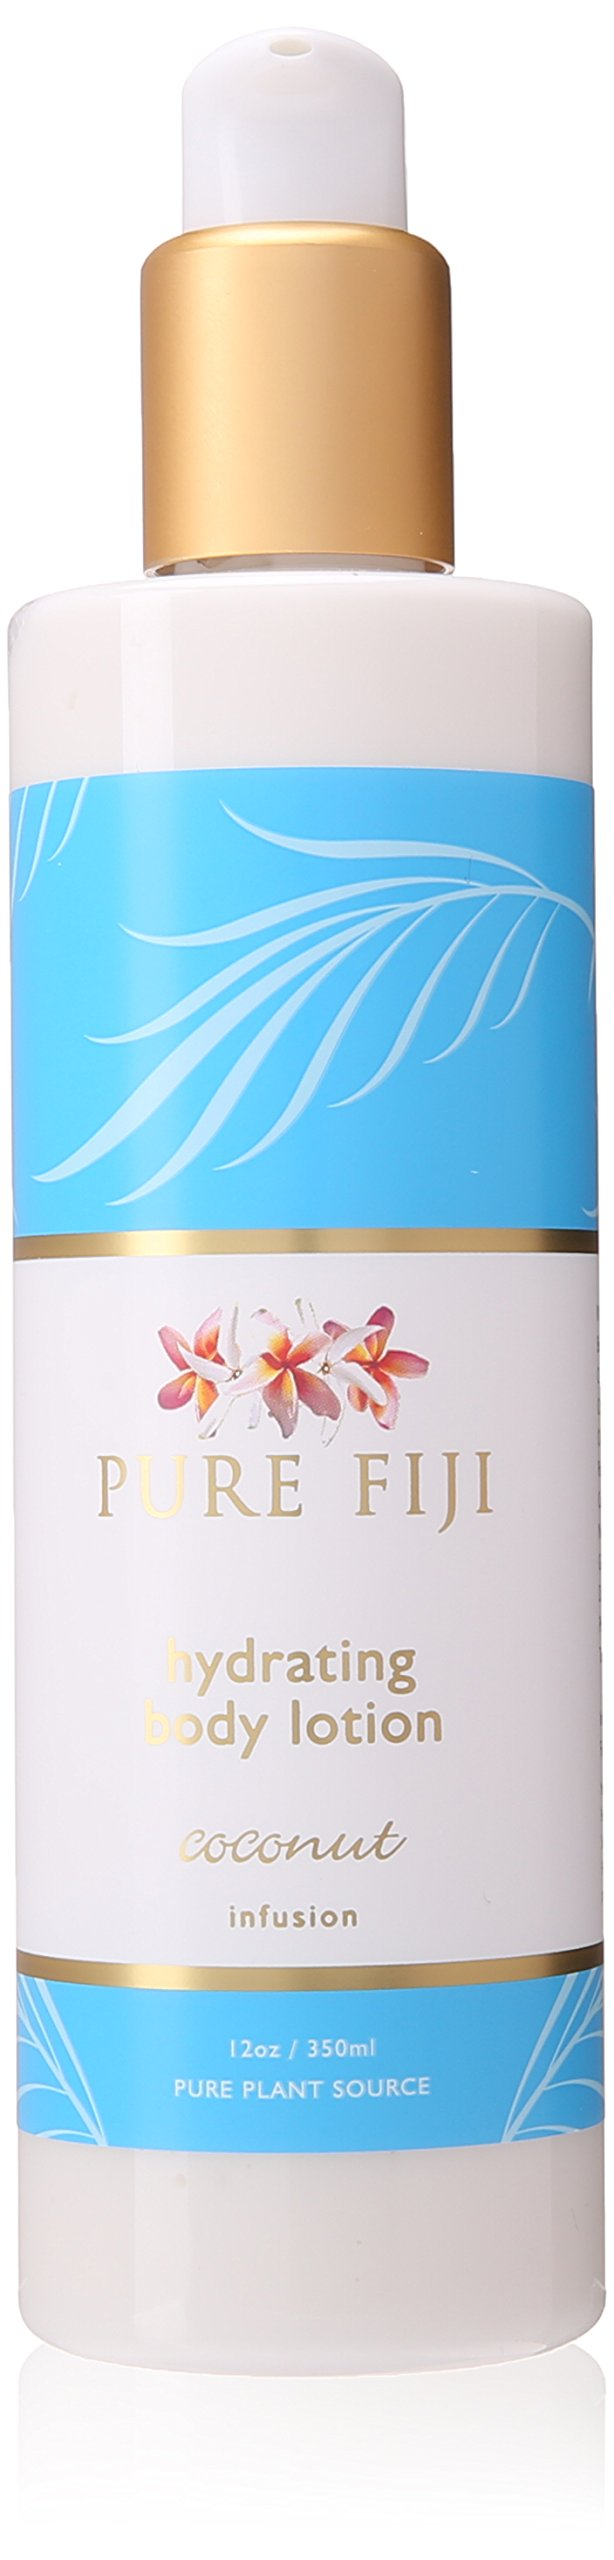 Pure Fiji Hydrating Body Lotion Coconut, 12 Ounce